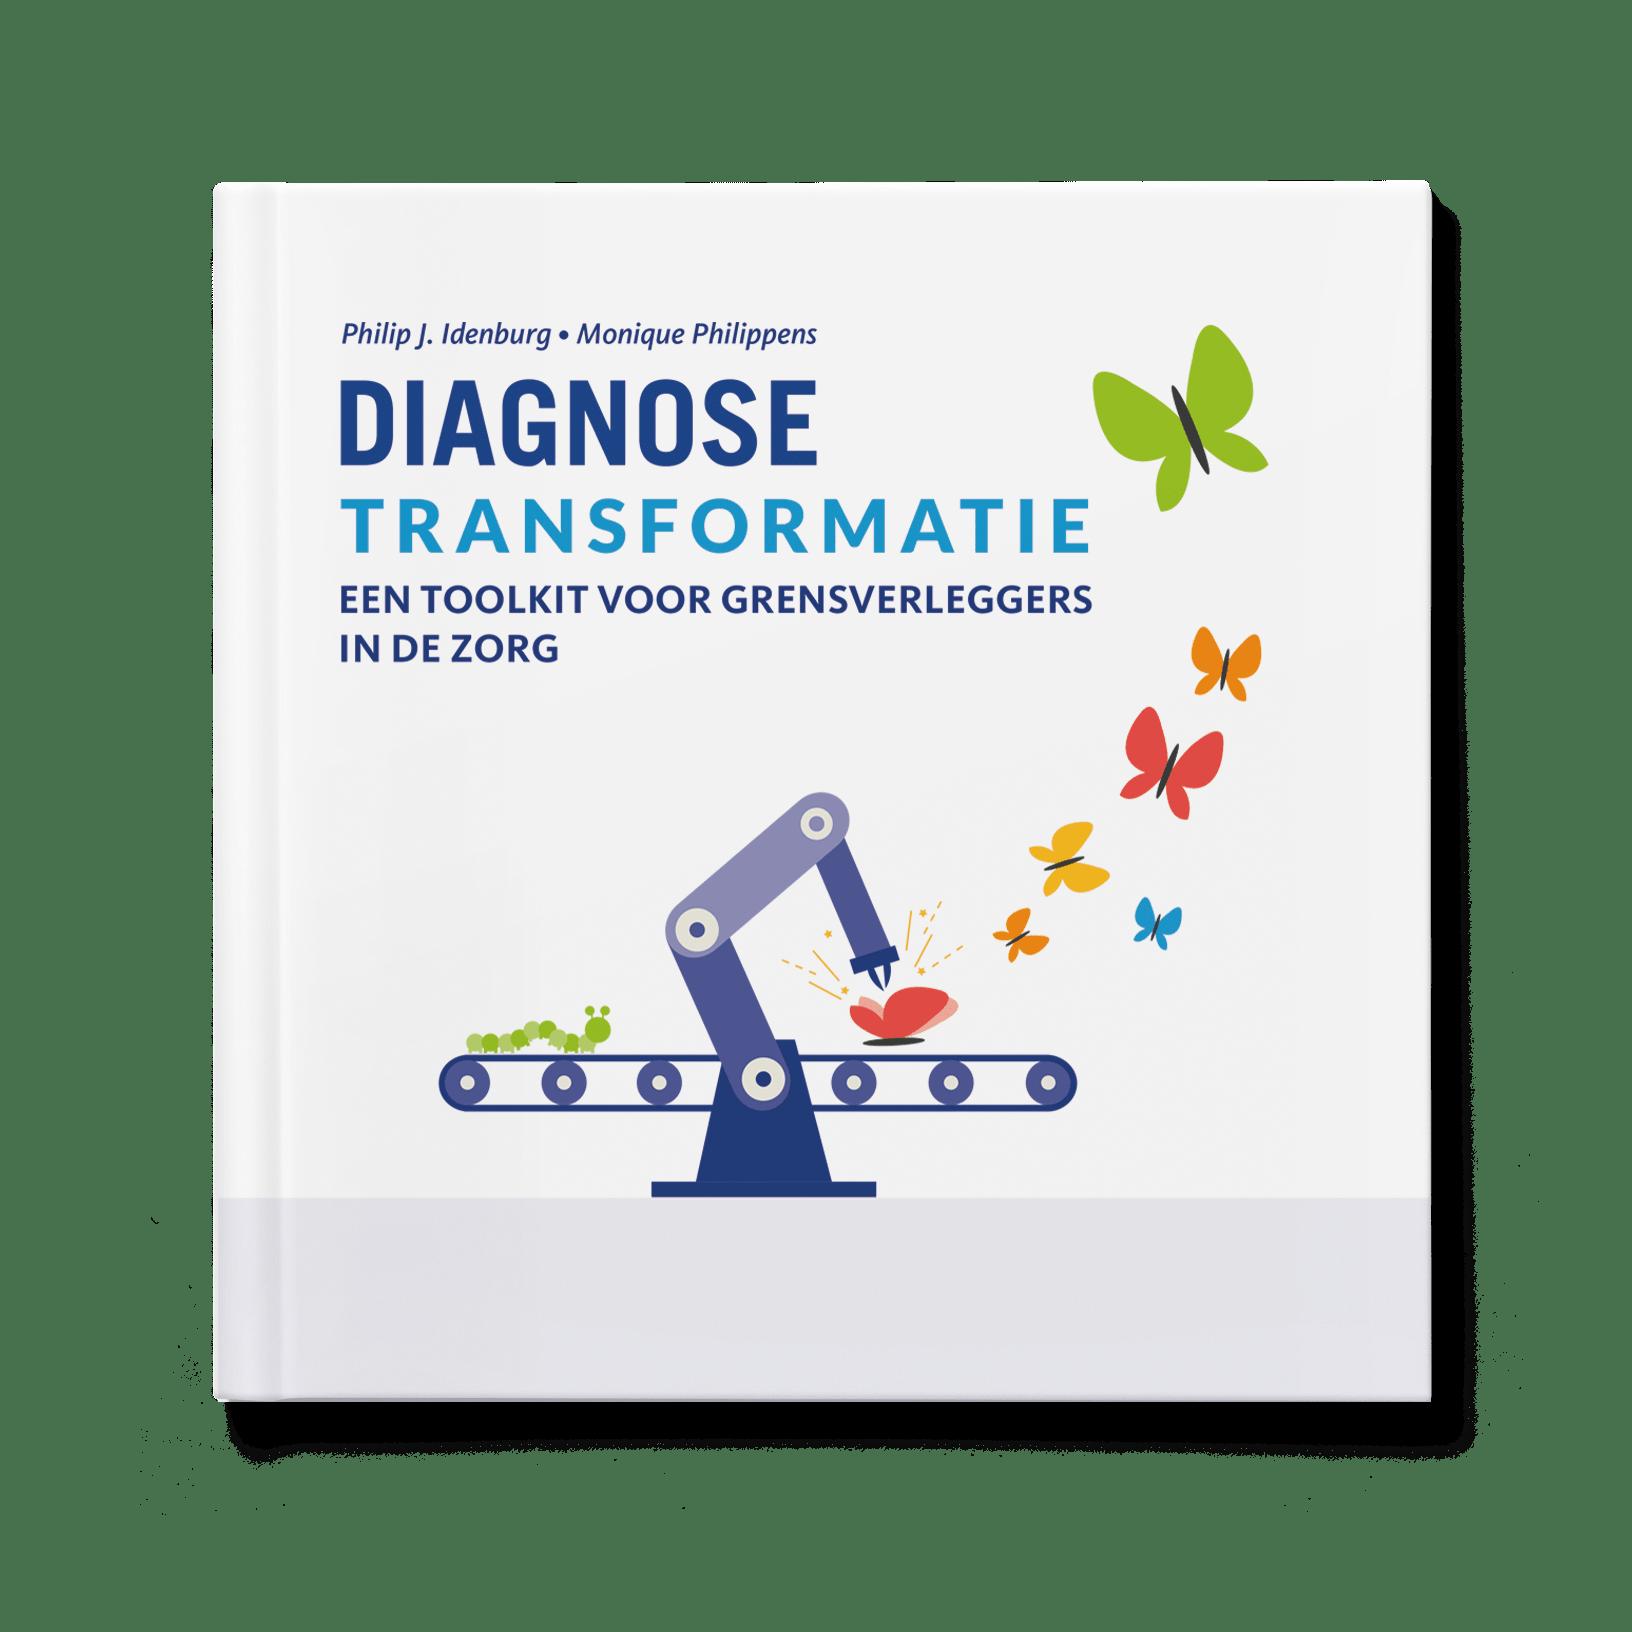 Diagnose transformatie